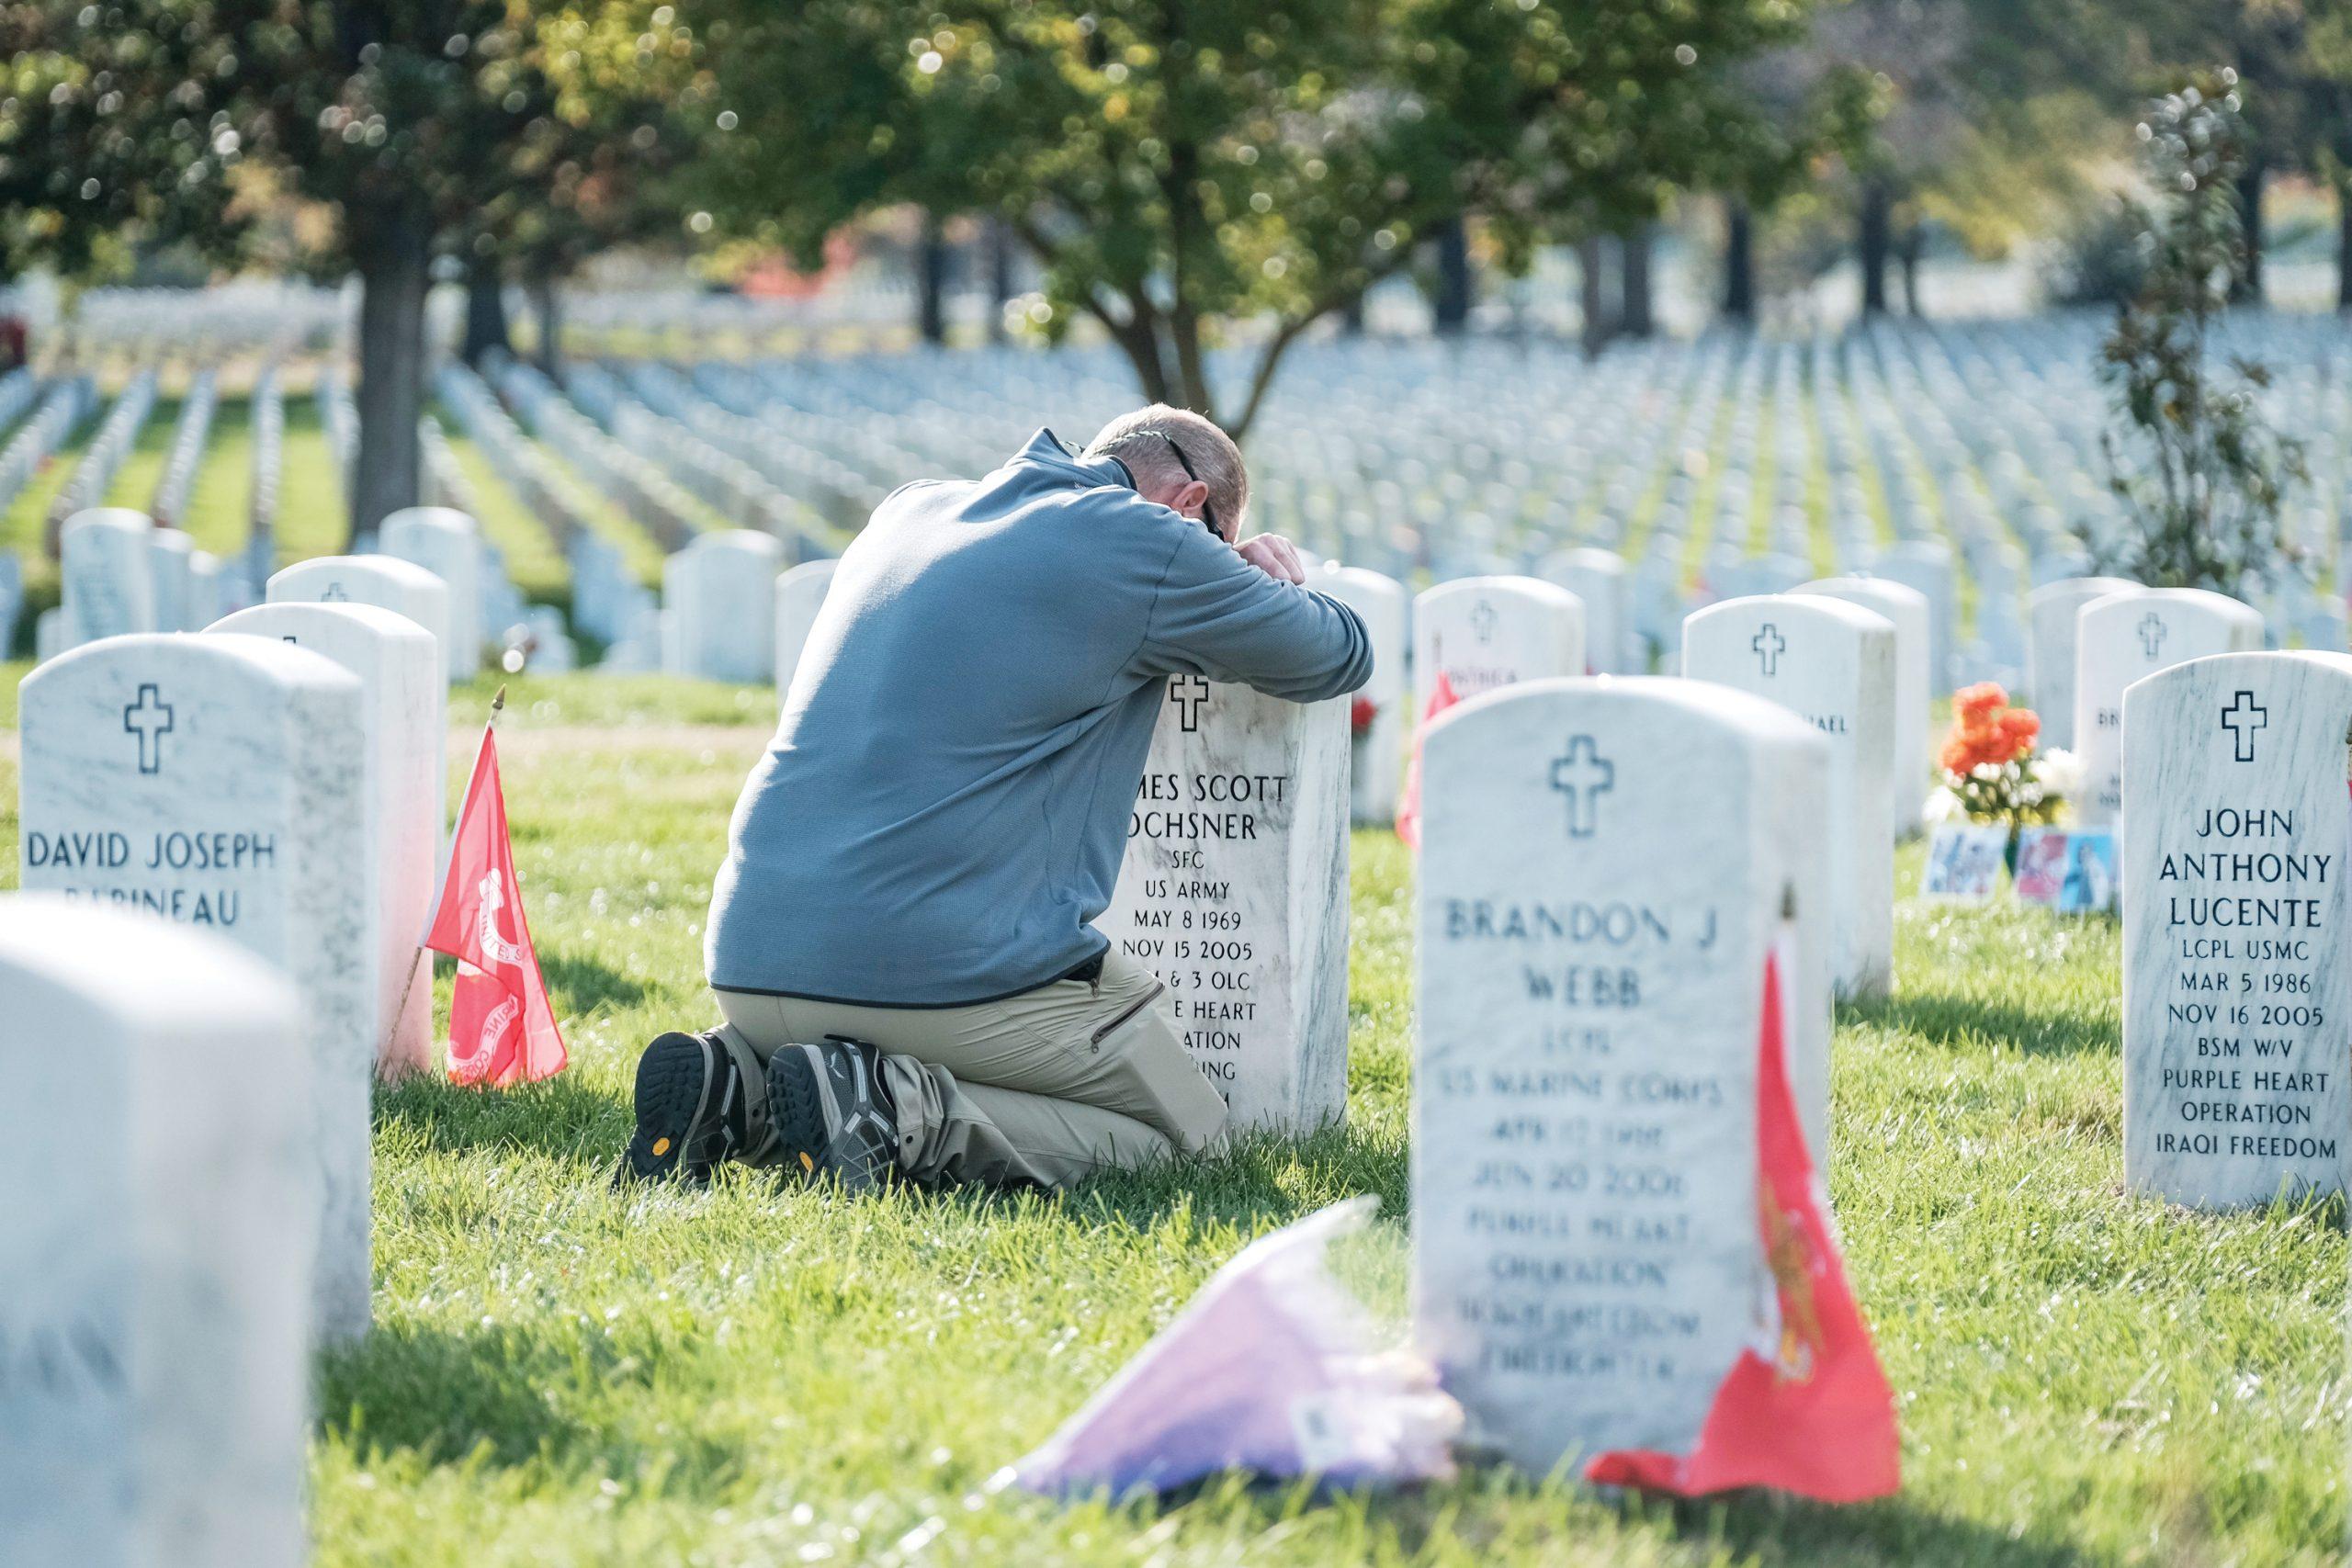 Limitan entrada durante Memorial Day